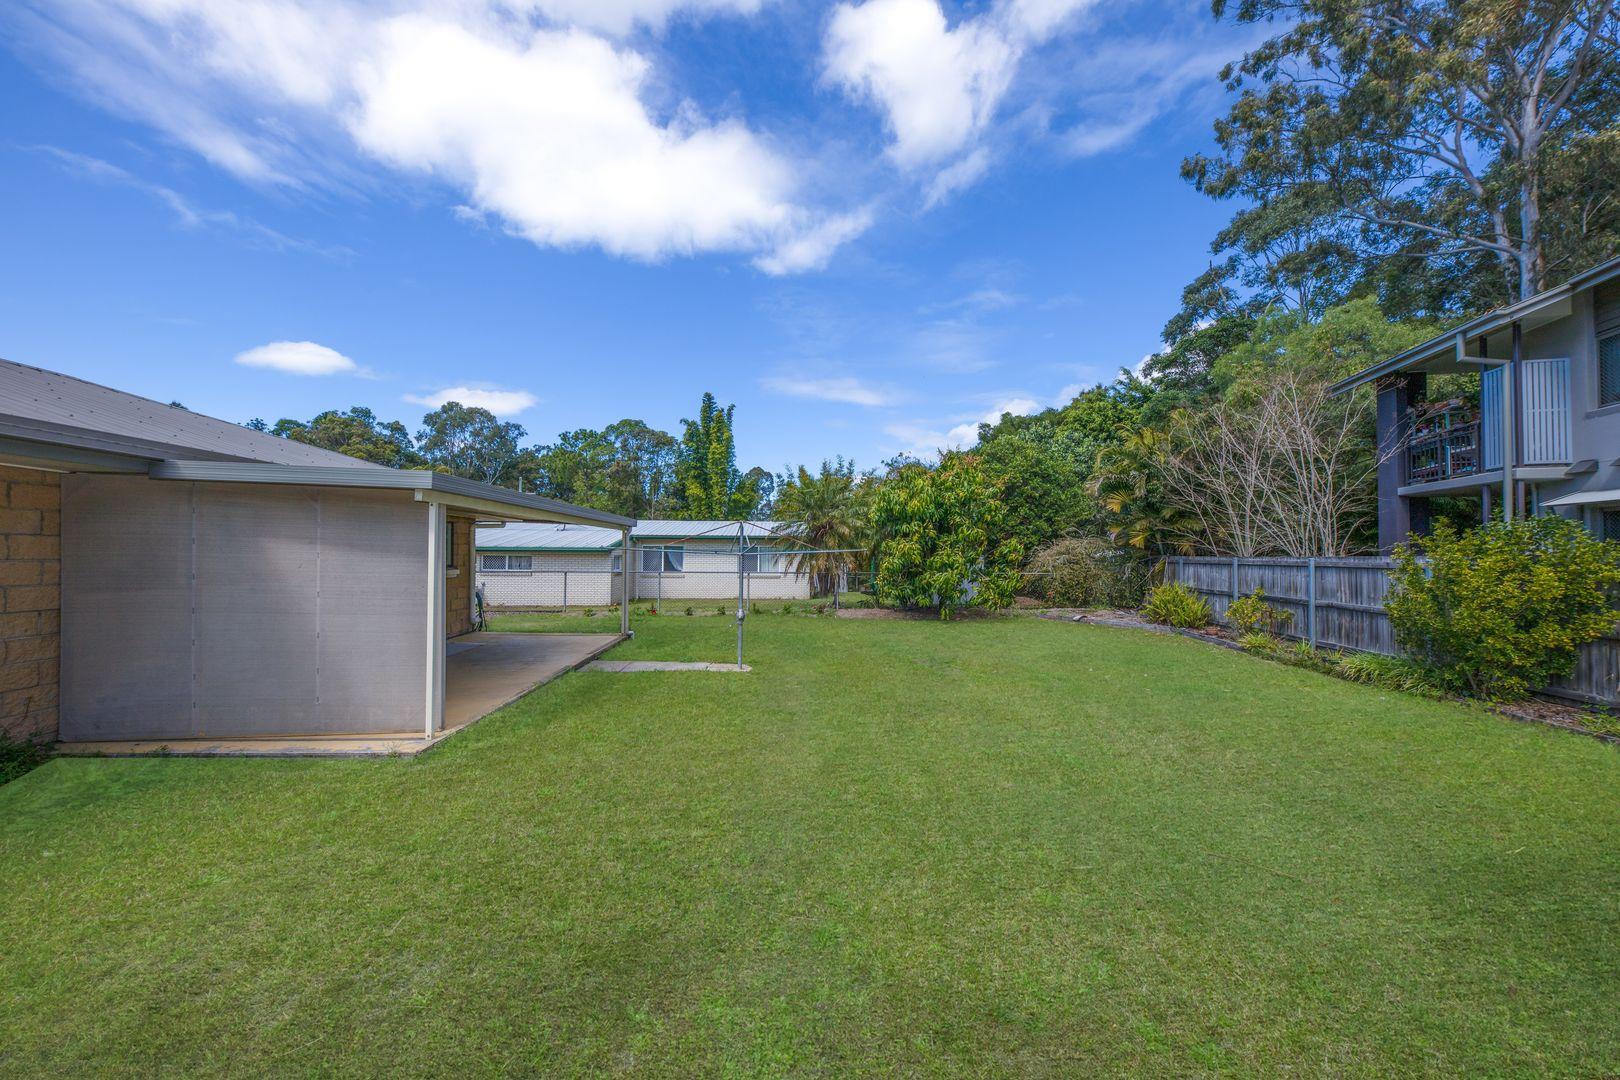 2/20 Gympie  Street North, Landsborough QLD 4550, Image 1